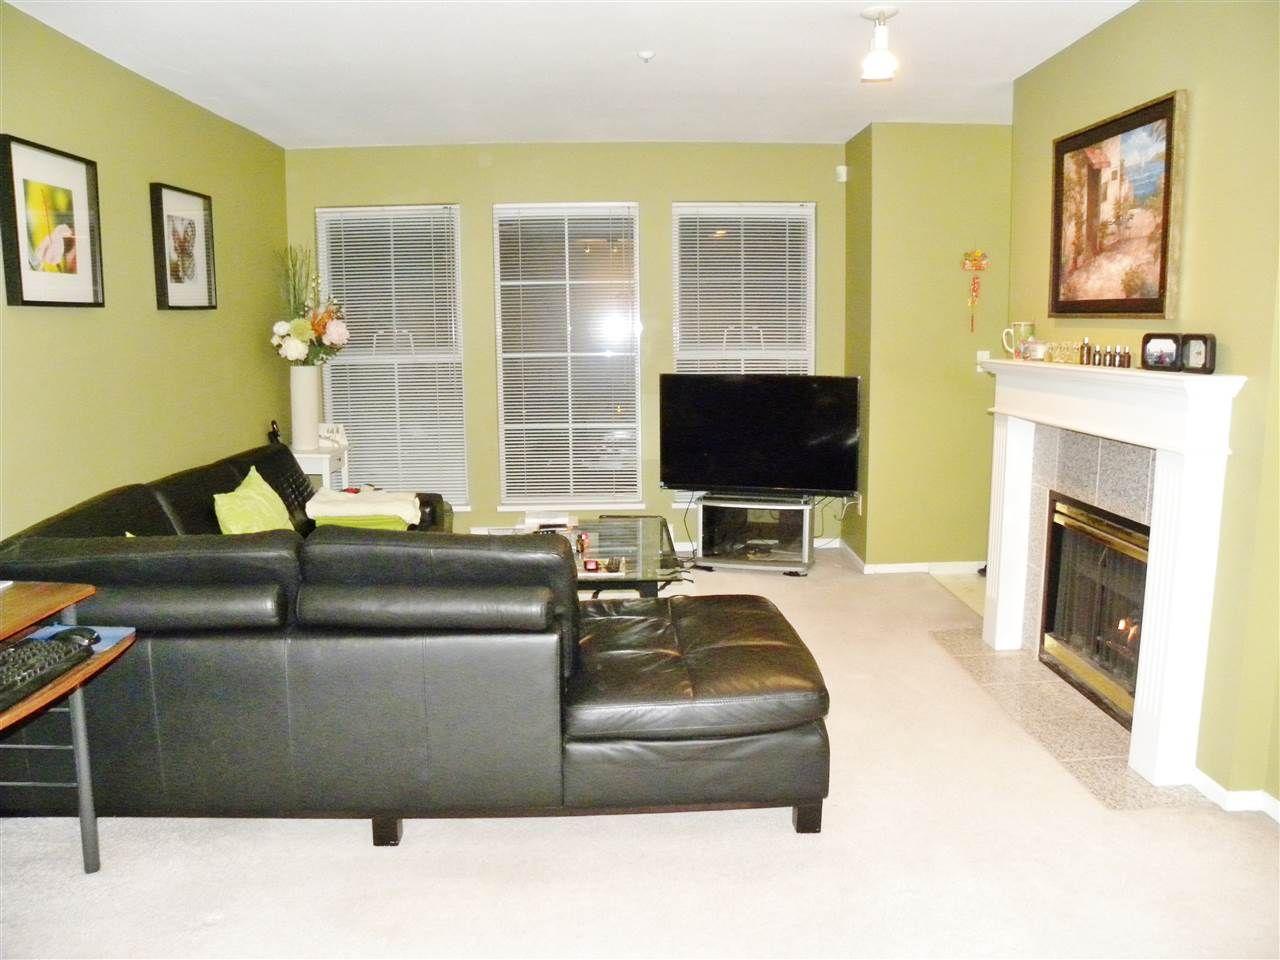 "Main Photo: 305 888 GAUTHIER Avenue in Coquitlam: Coquitlam West Condo for sale in ""LA BRITTANY"" : MLS®# R2041119"